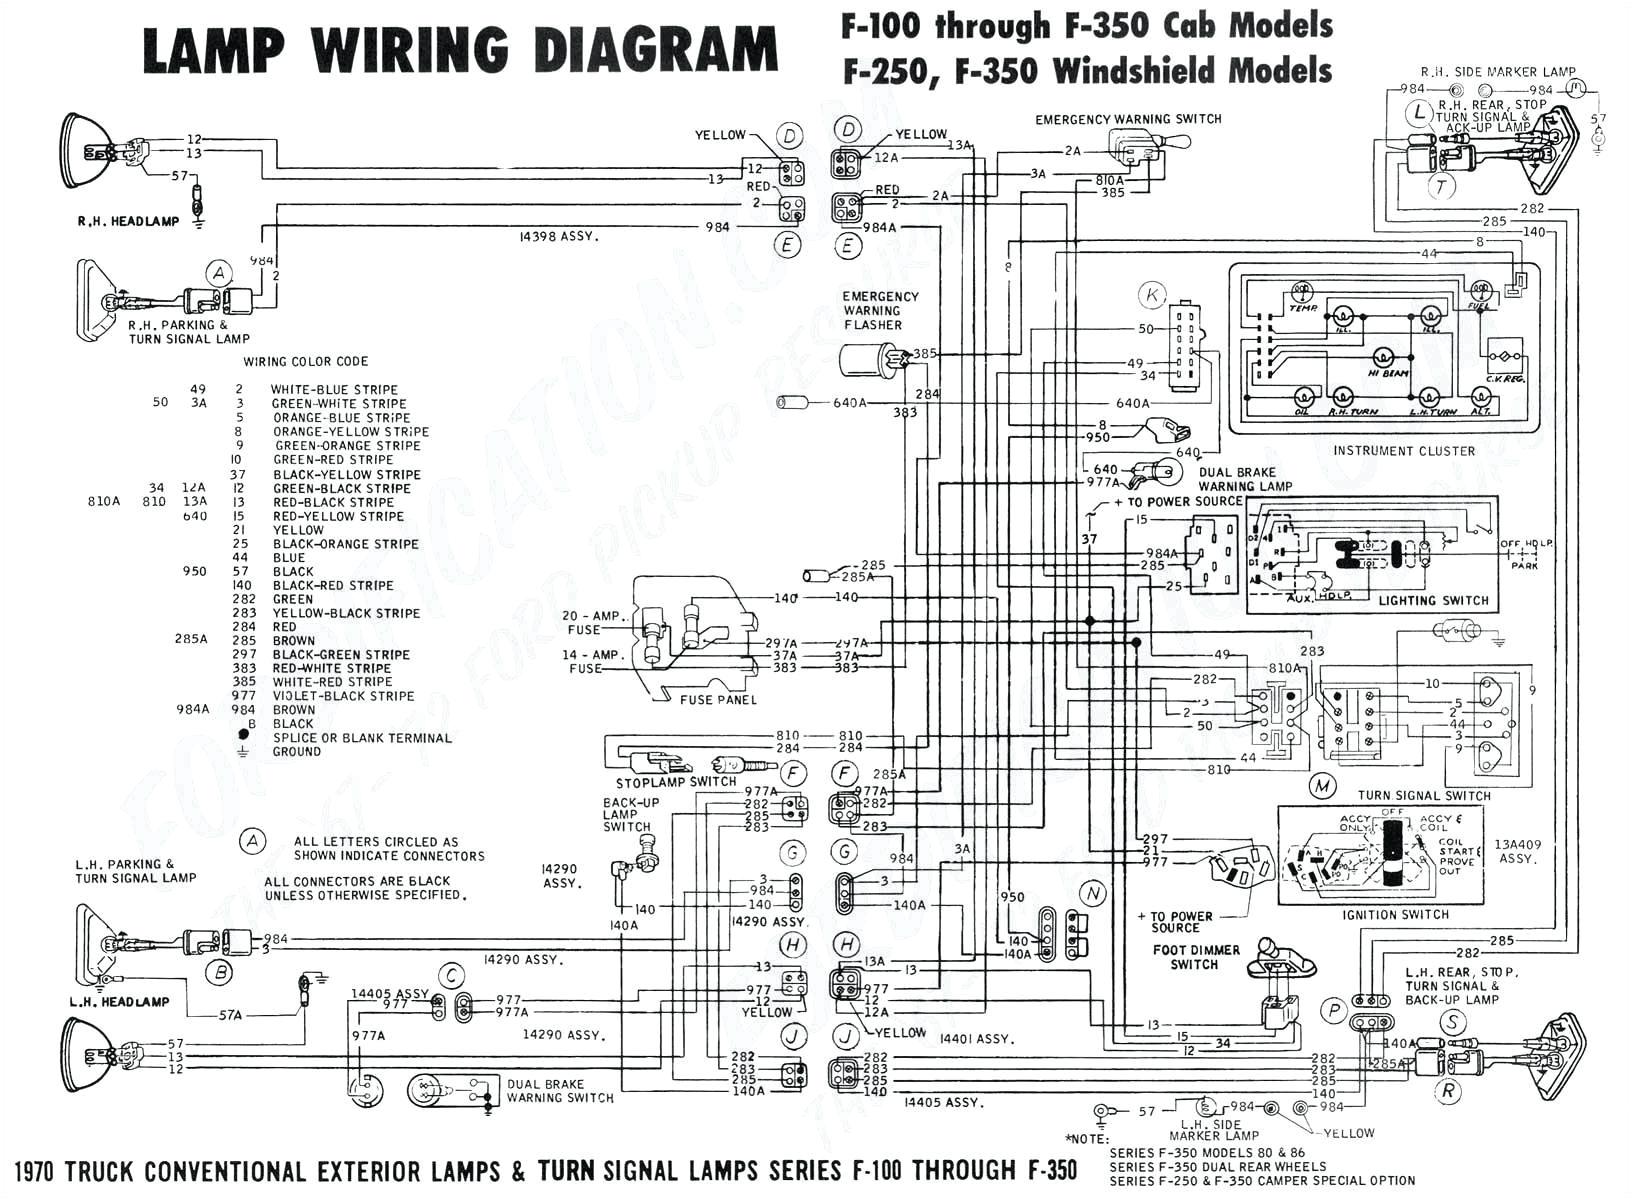 Lanzar Max Pro 15 Wiring Diagram Mitsubishi Tv Wiring Diagram Data Wiring Diagram